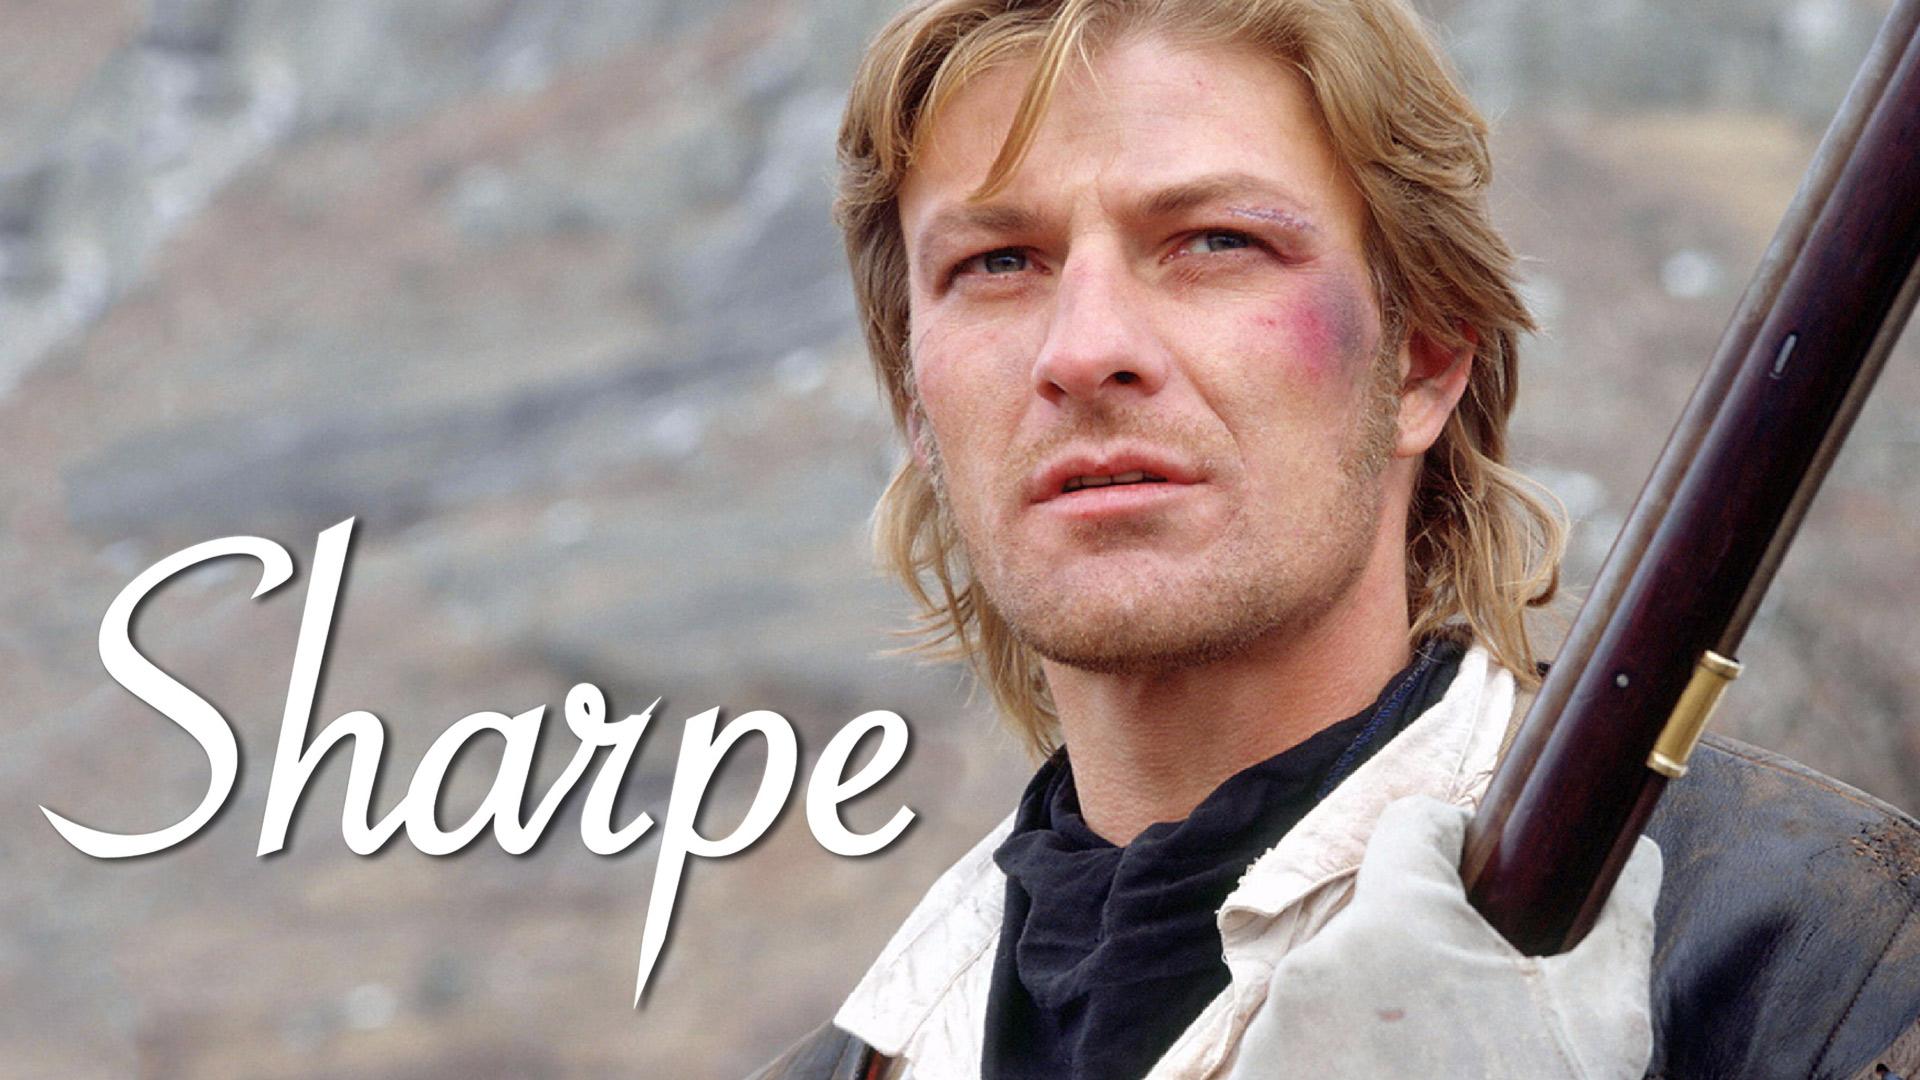 Sharpe, Season 1